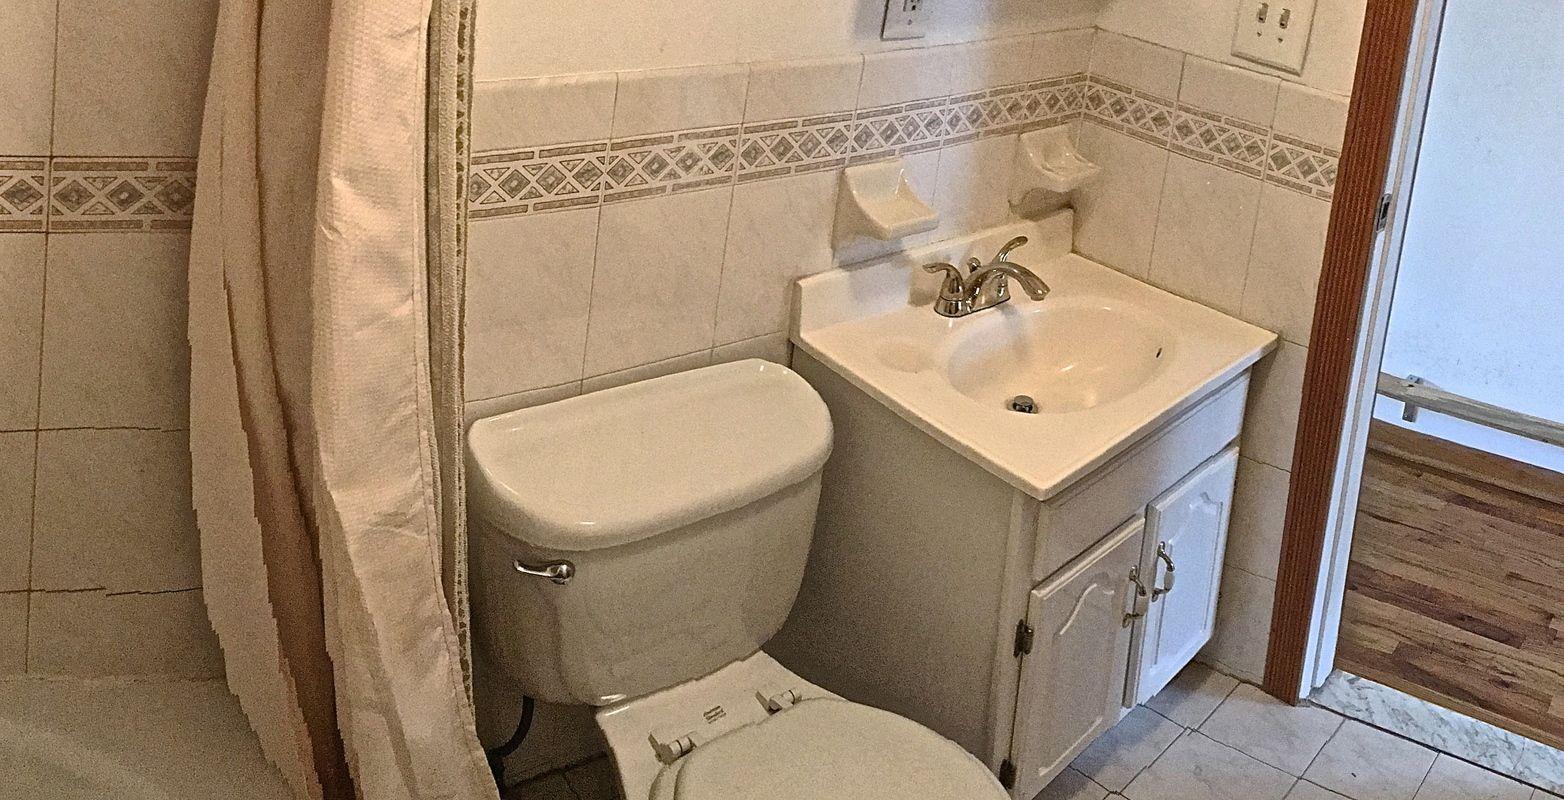 Q Healthydetroiter B Bathroom Flooring And Shower He Image Cabinetandra Tavern